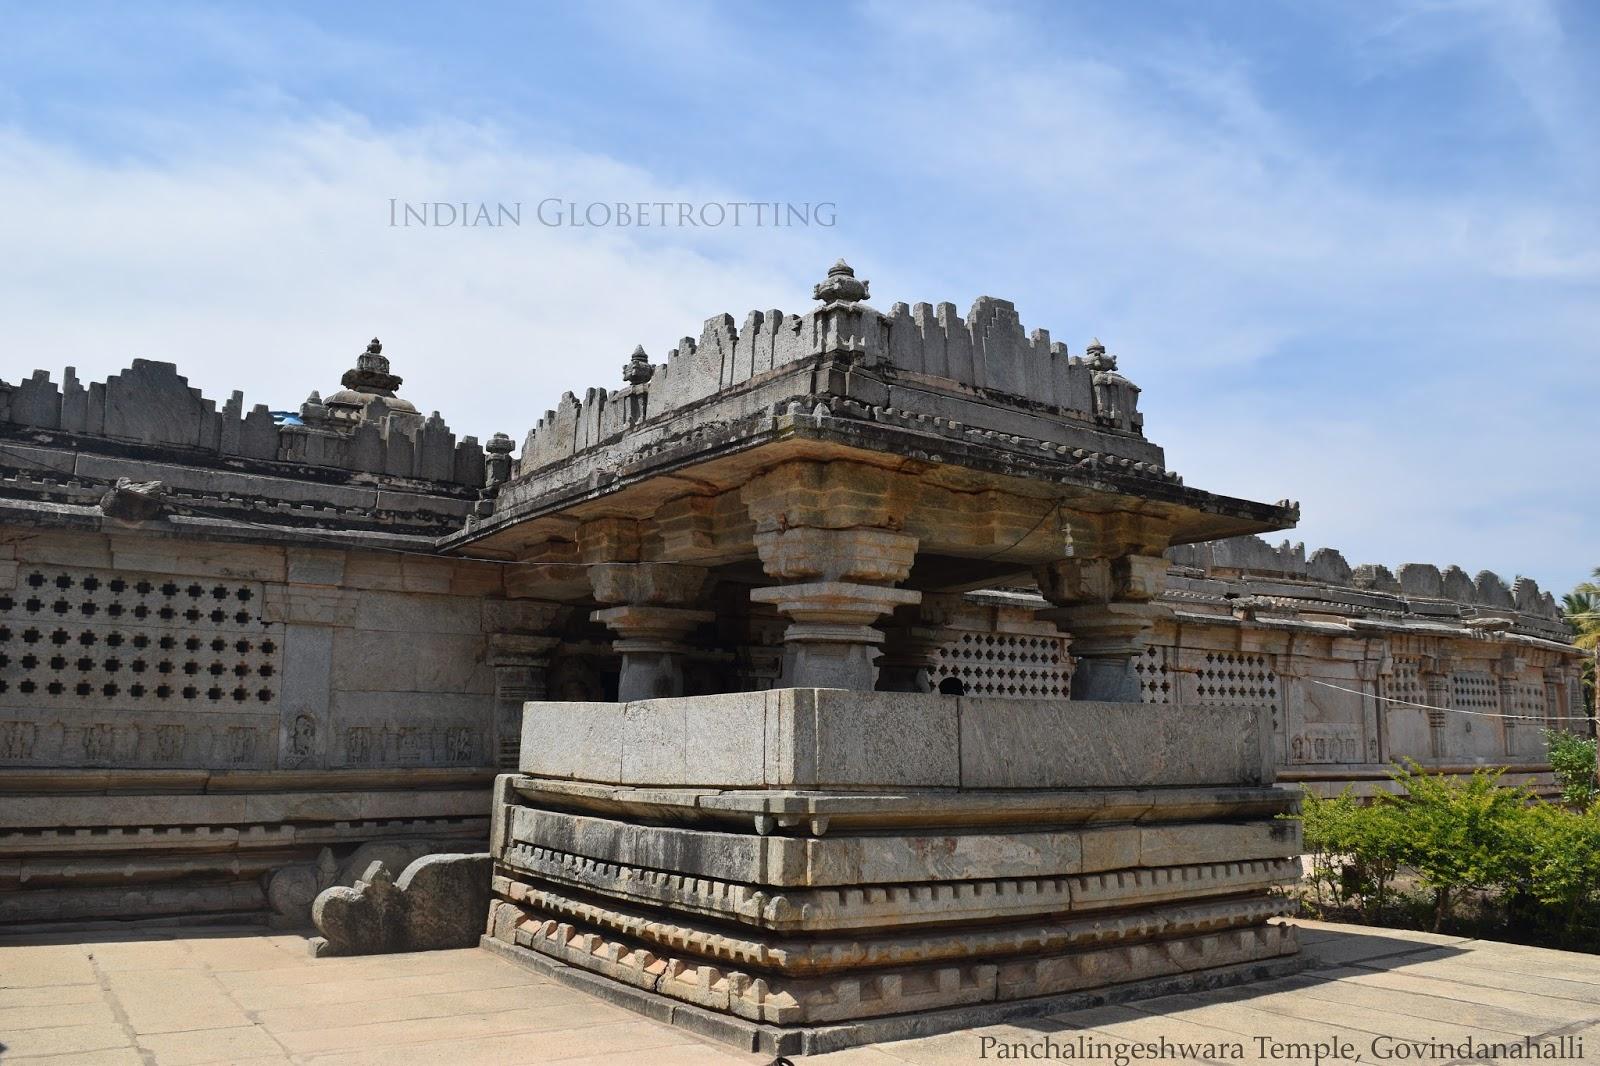 Panchalingeshwara Temple in govindanahalli in karnataka